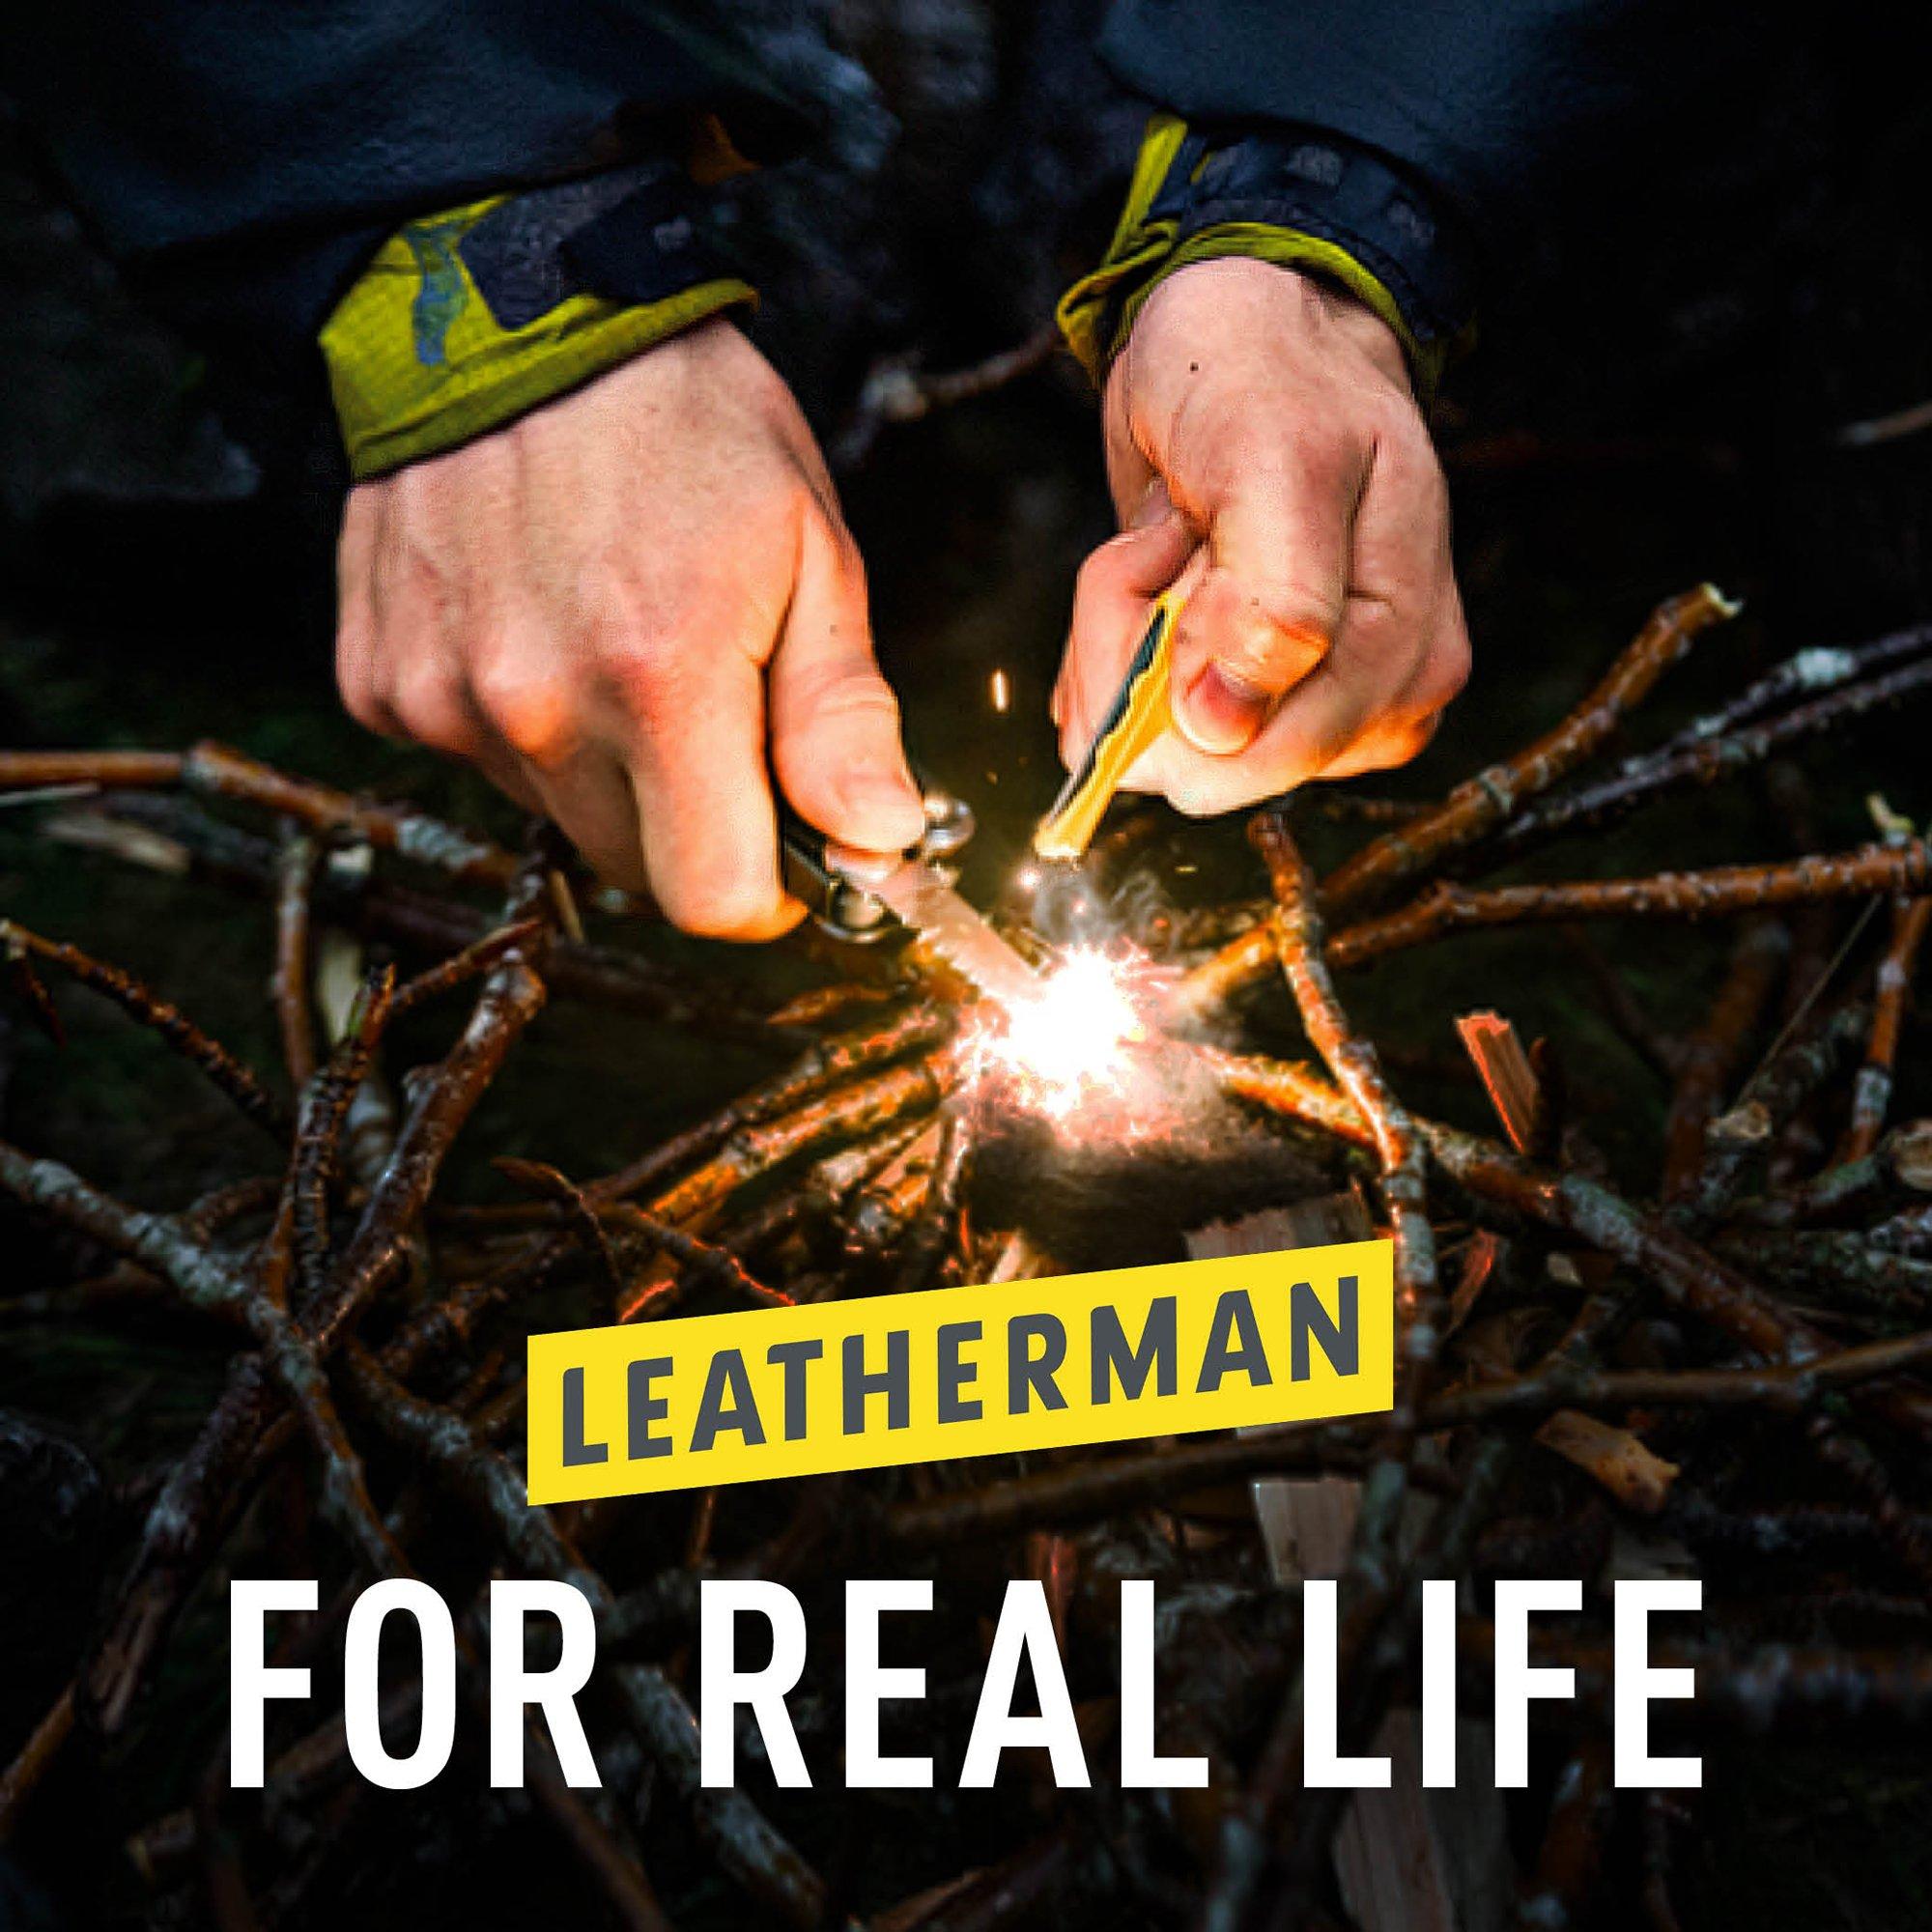 Leatherman - Bit Kit, 21 Double-Ended Bits by LEATHERMAN (Image #10)